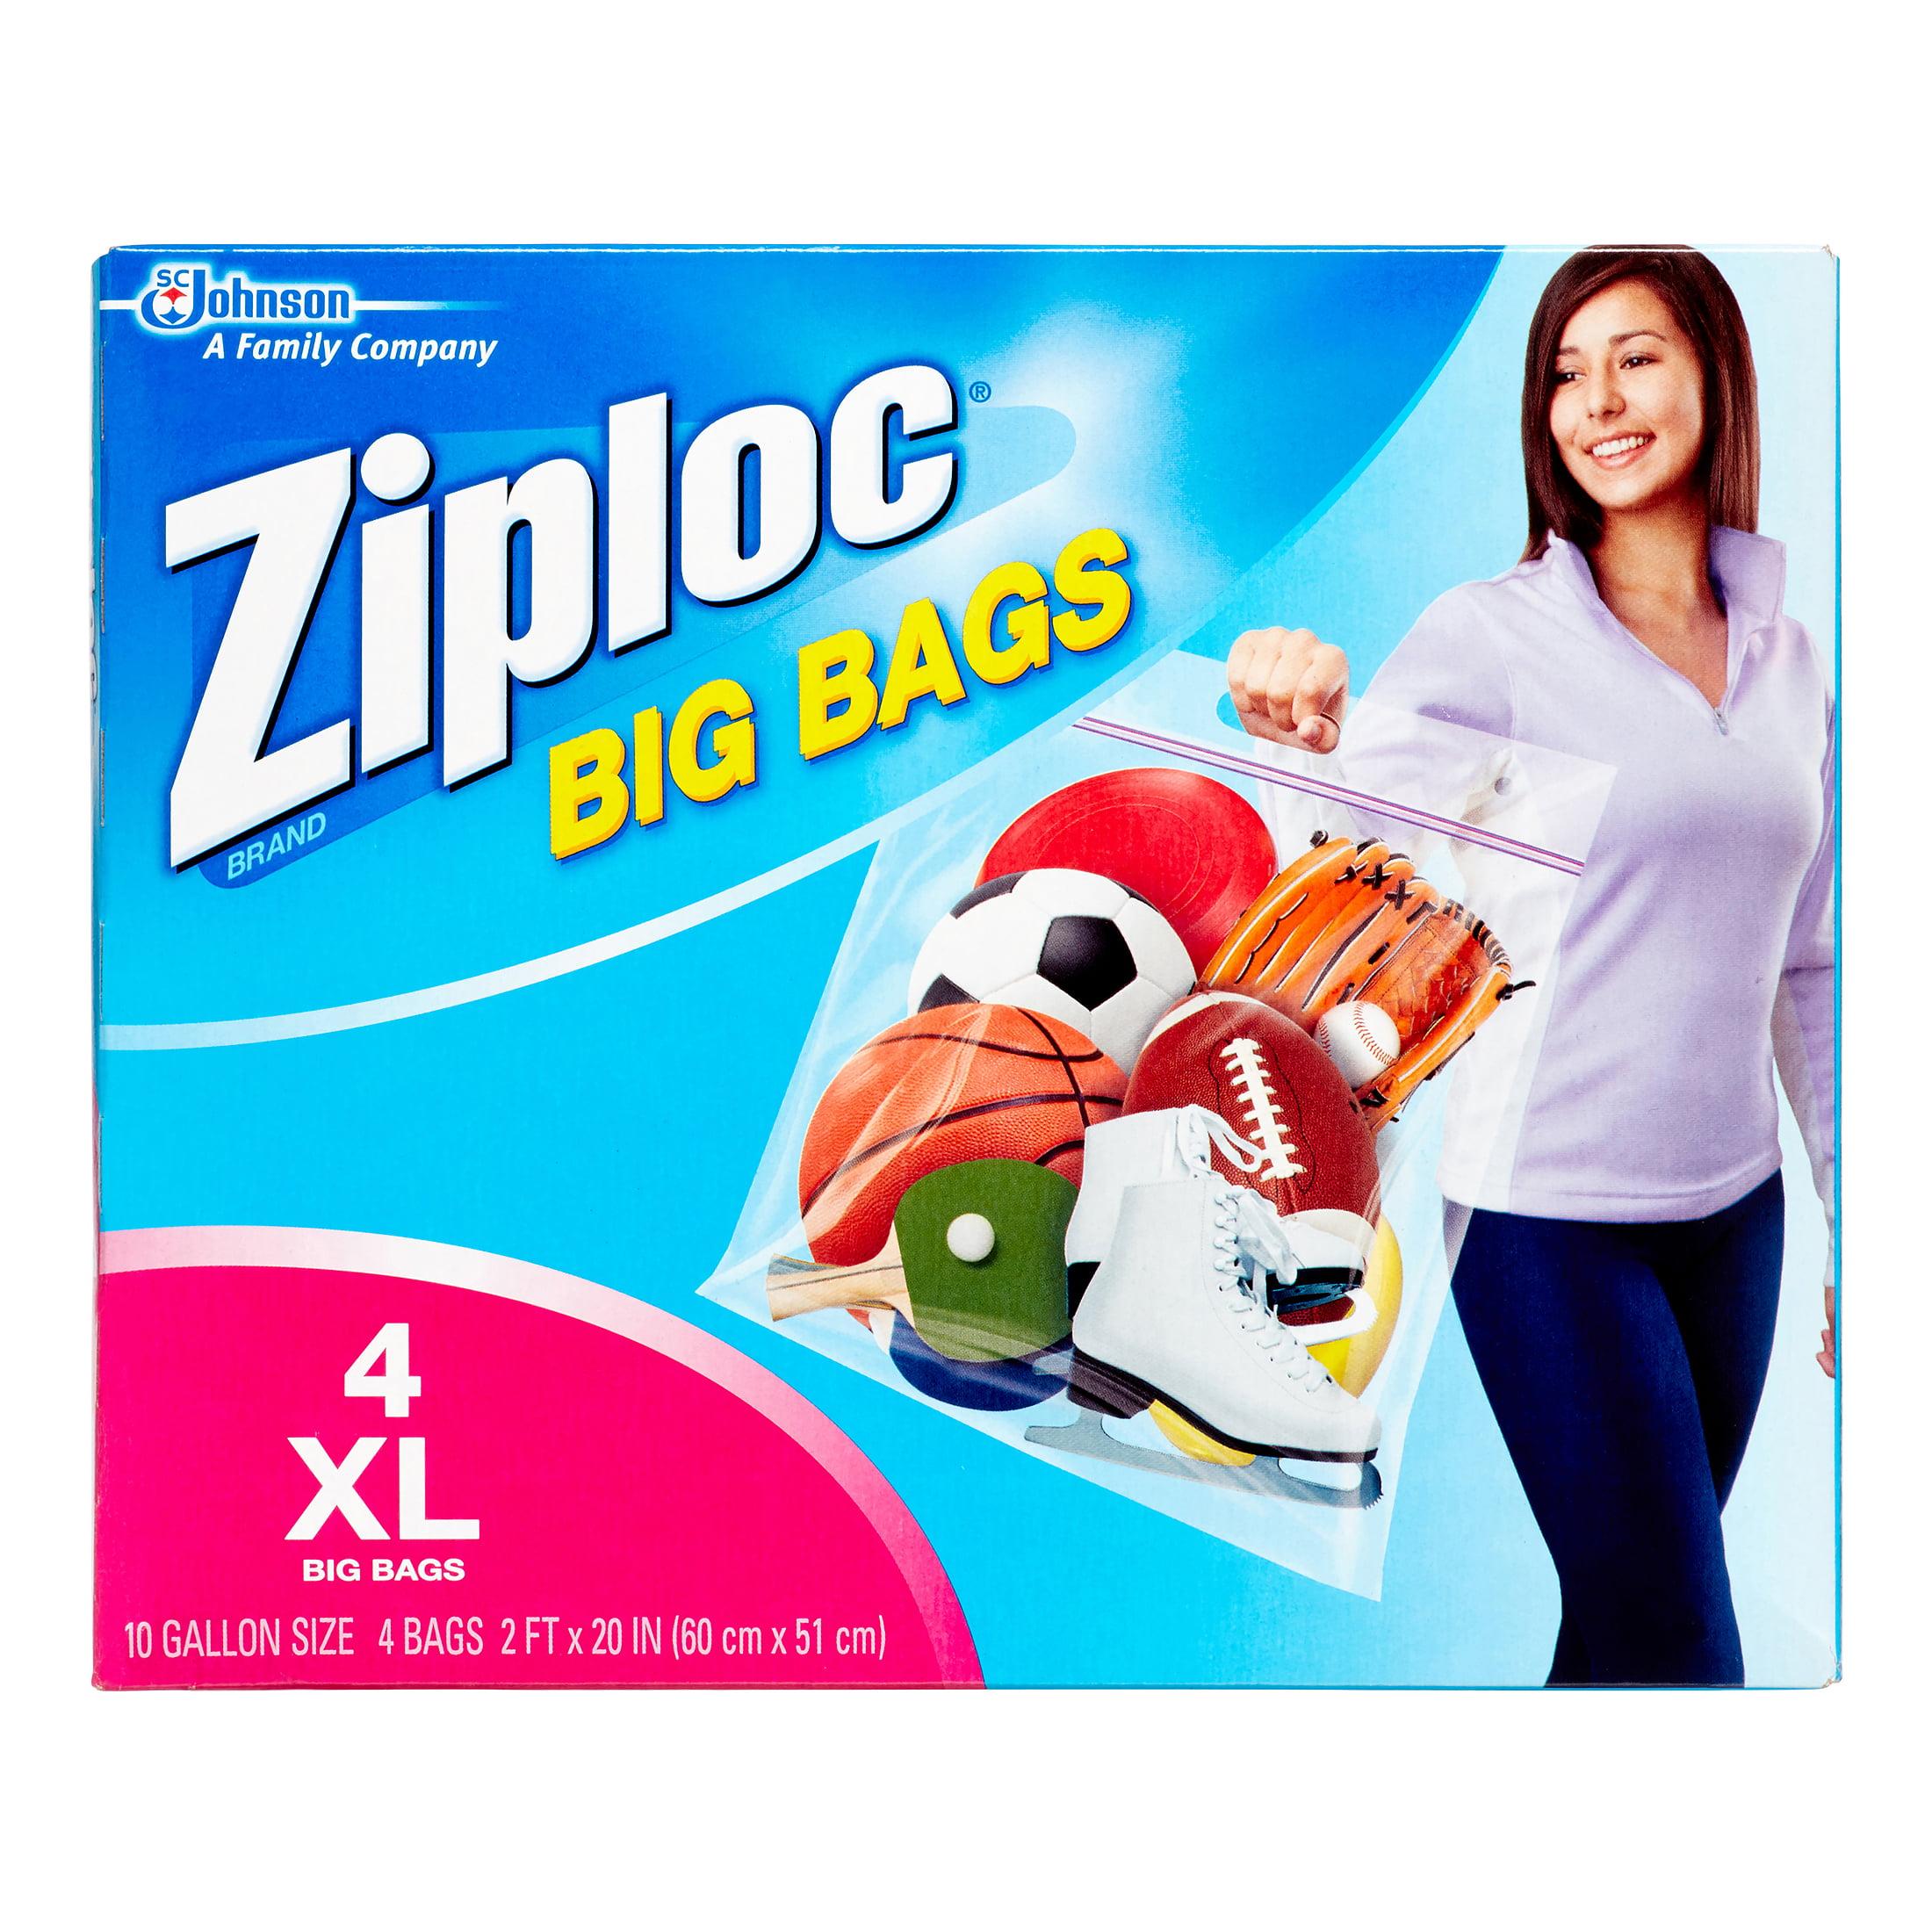 Ziploc Heavy Duty XL Big Bags, 4 ct